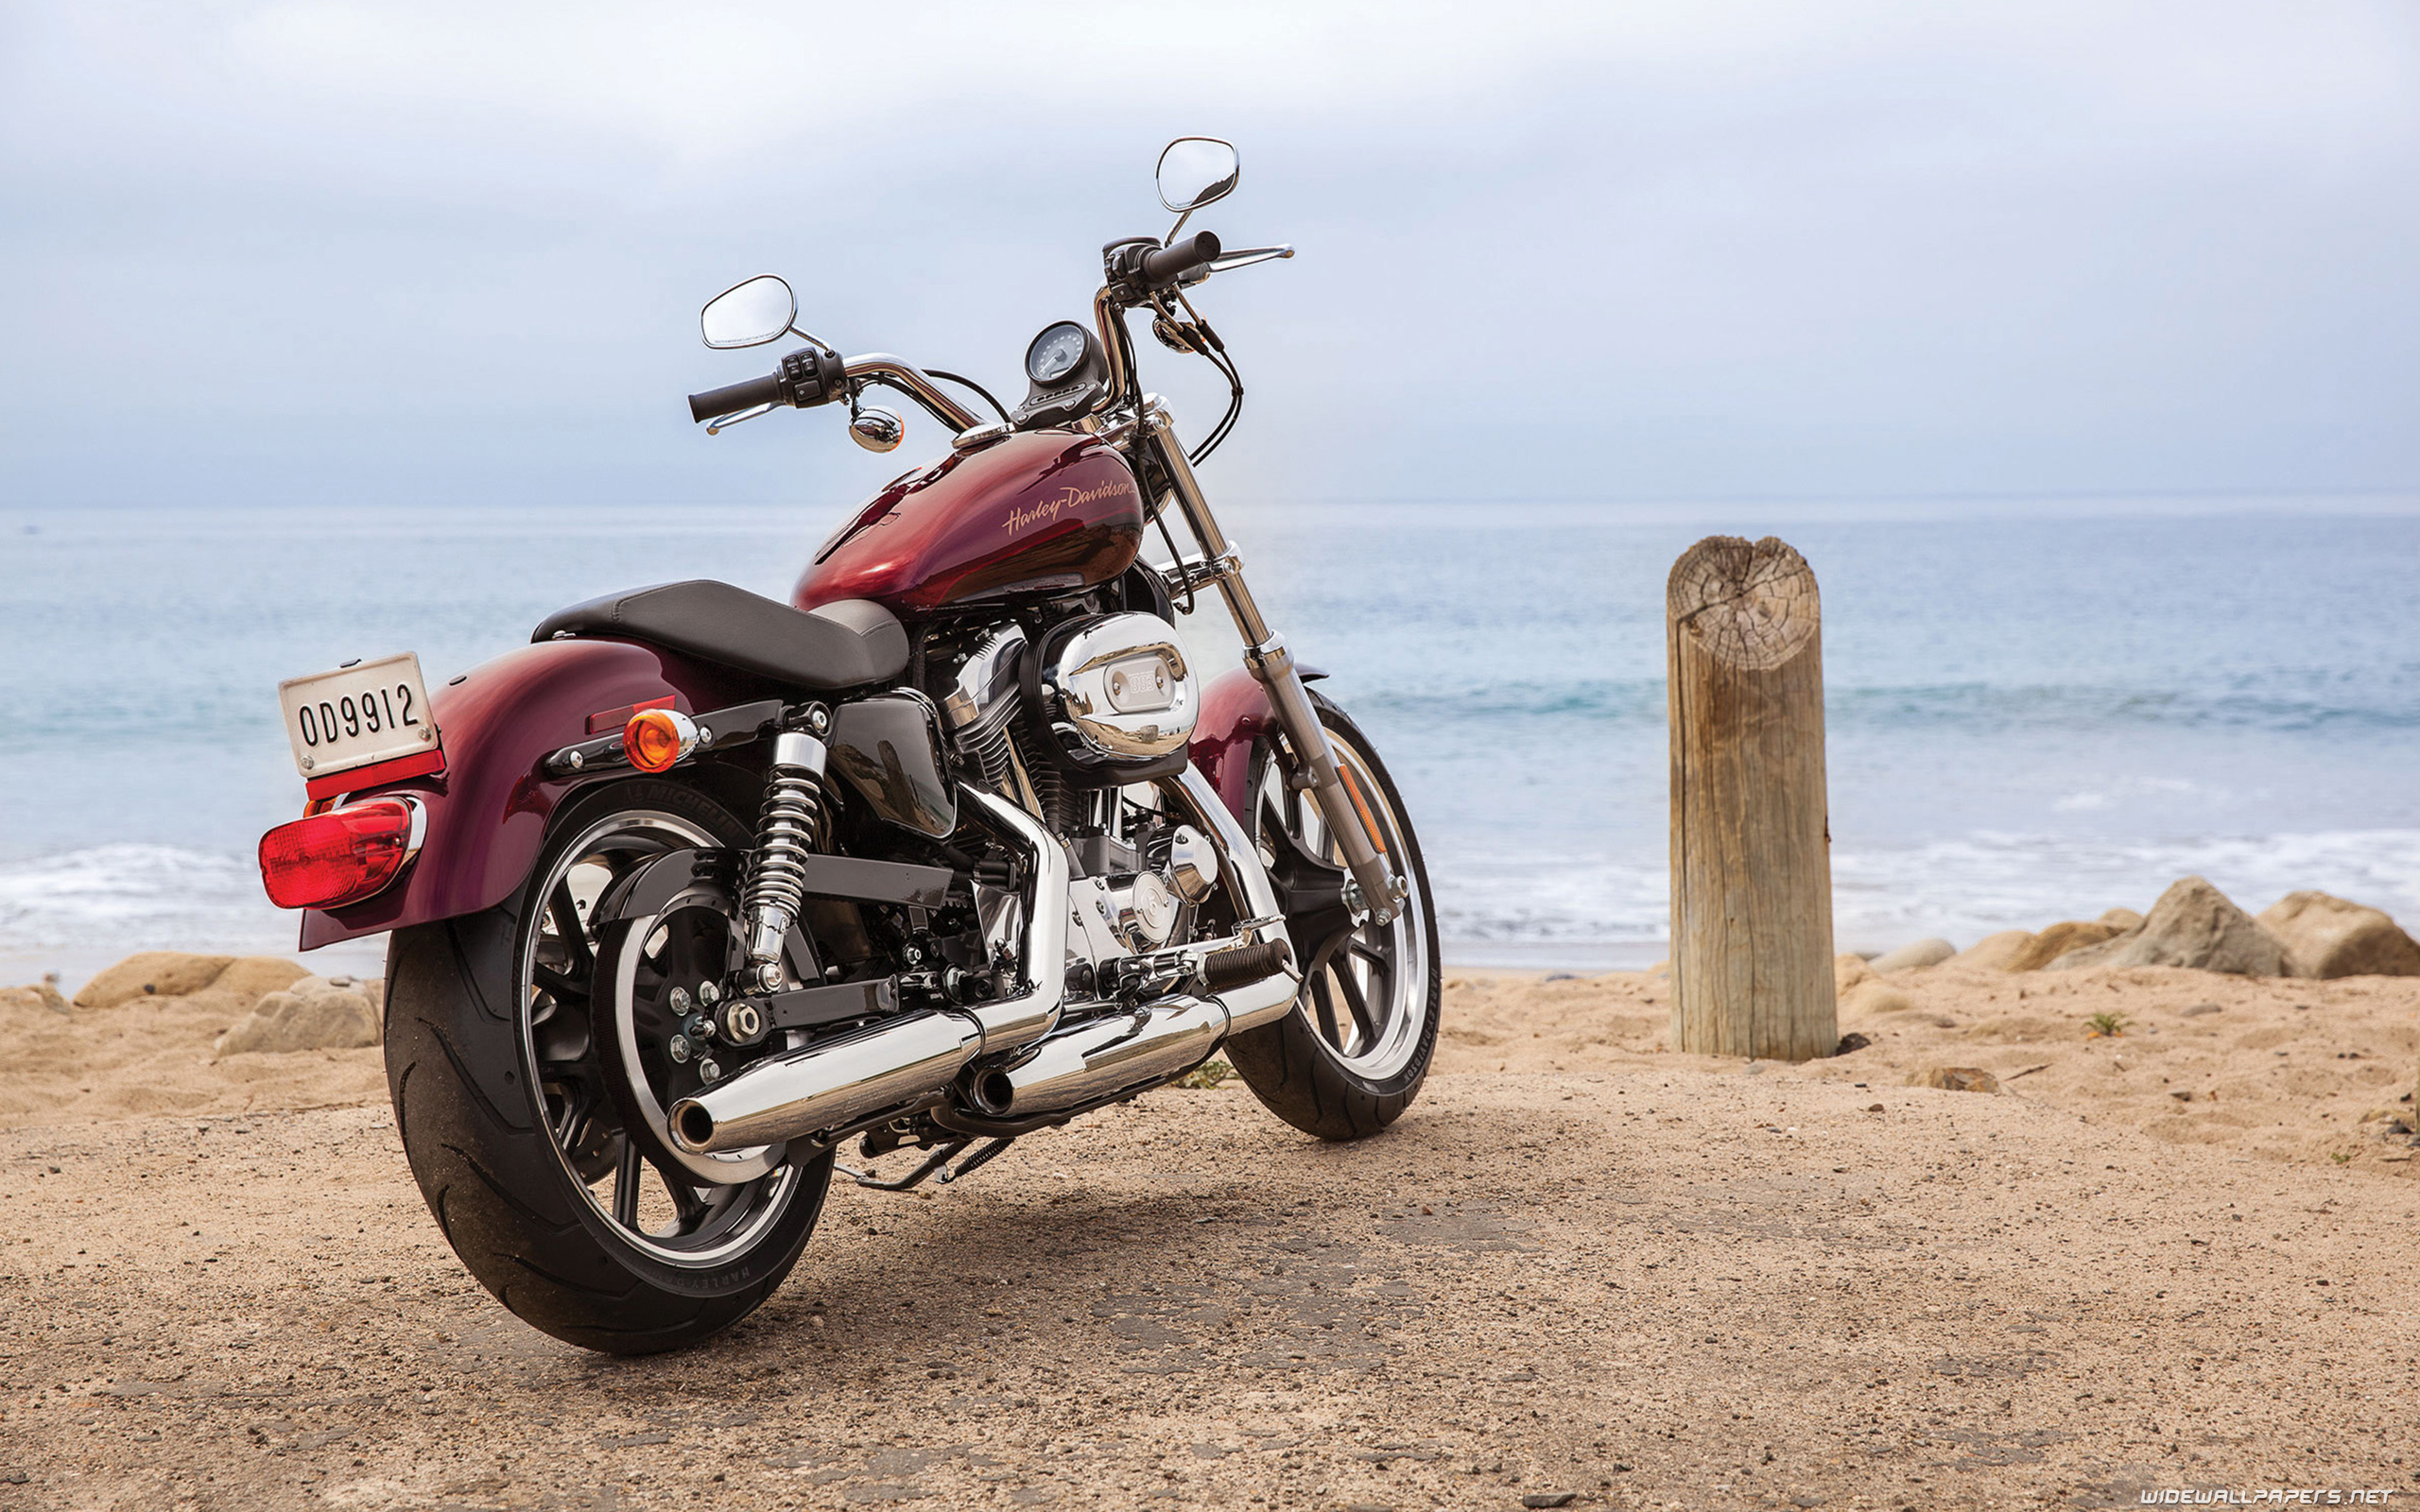 Harley Davidson Sportster motorcycle desktop wallpapers 4K 2560x1600